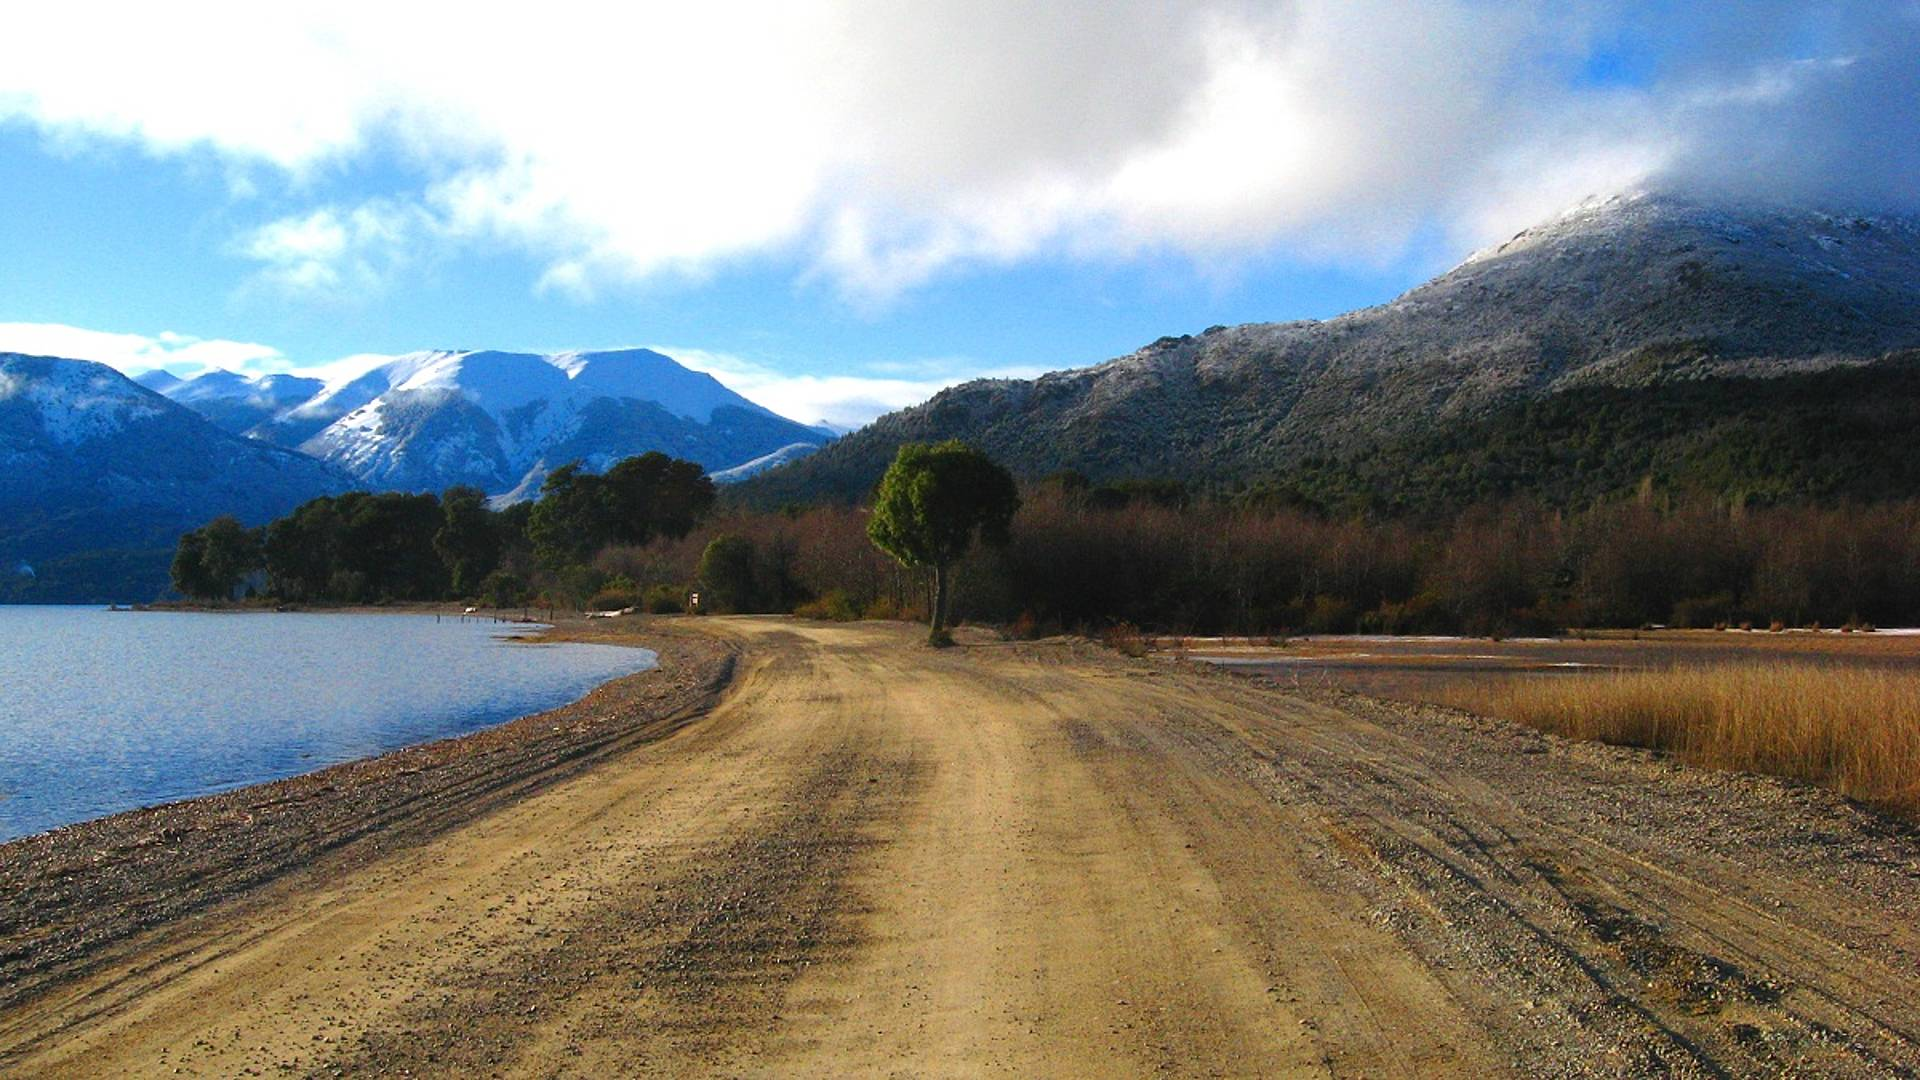 Patagonie sauvage, hors des sentiers battus